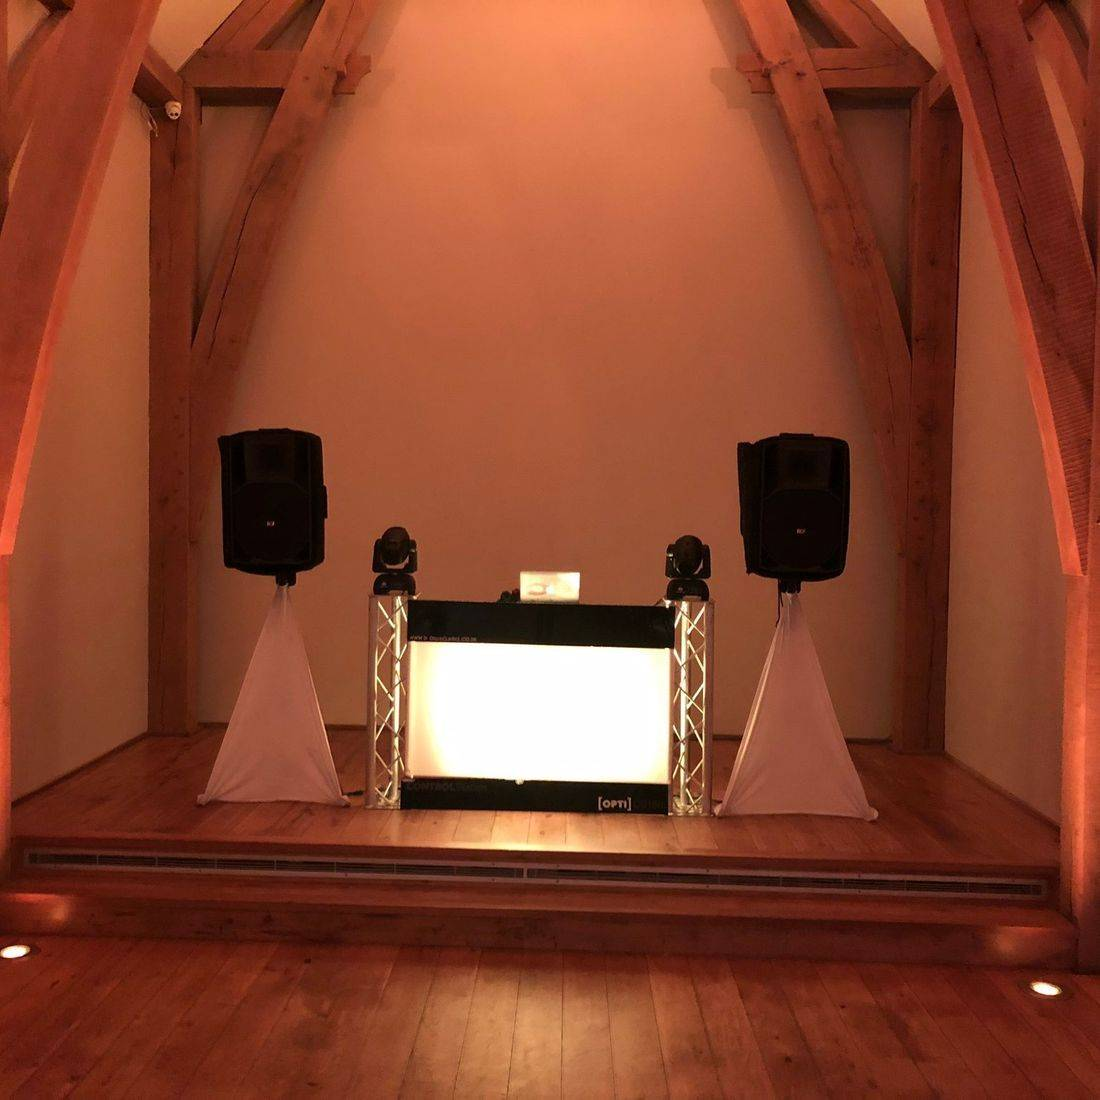 The Mill Barns #Worcesterhsire #wedding #dj #weddingentertainment #barn #barnwedding